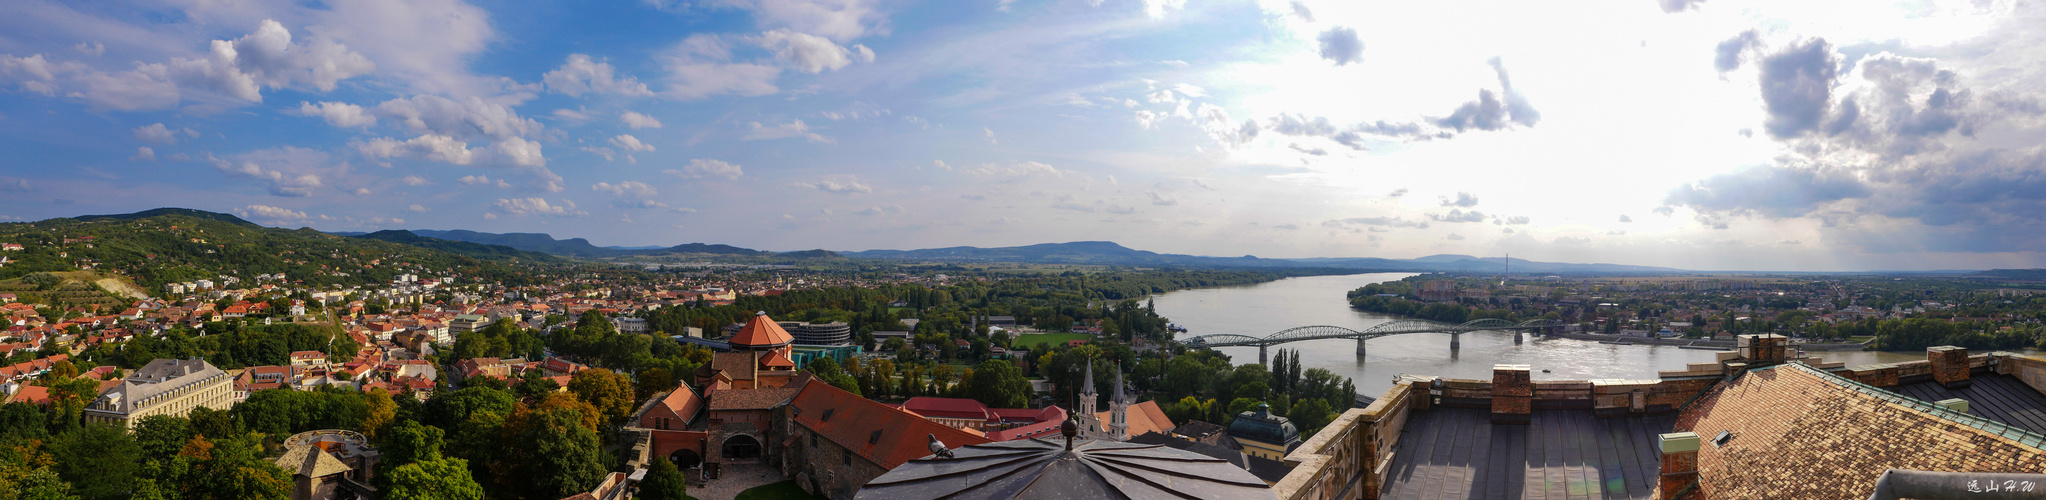 Esztergom,Hungary